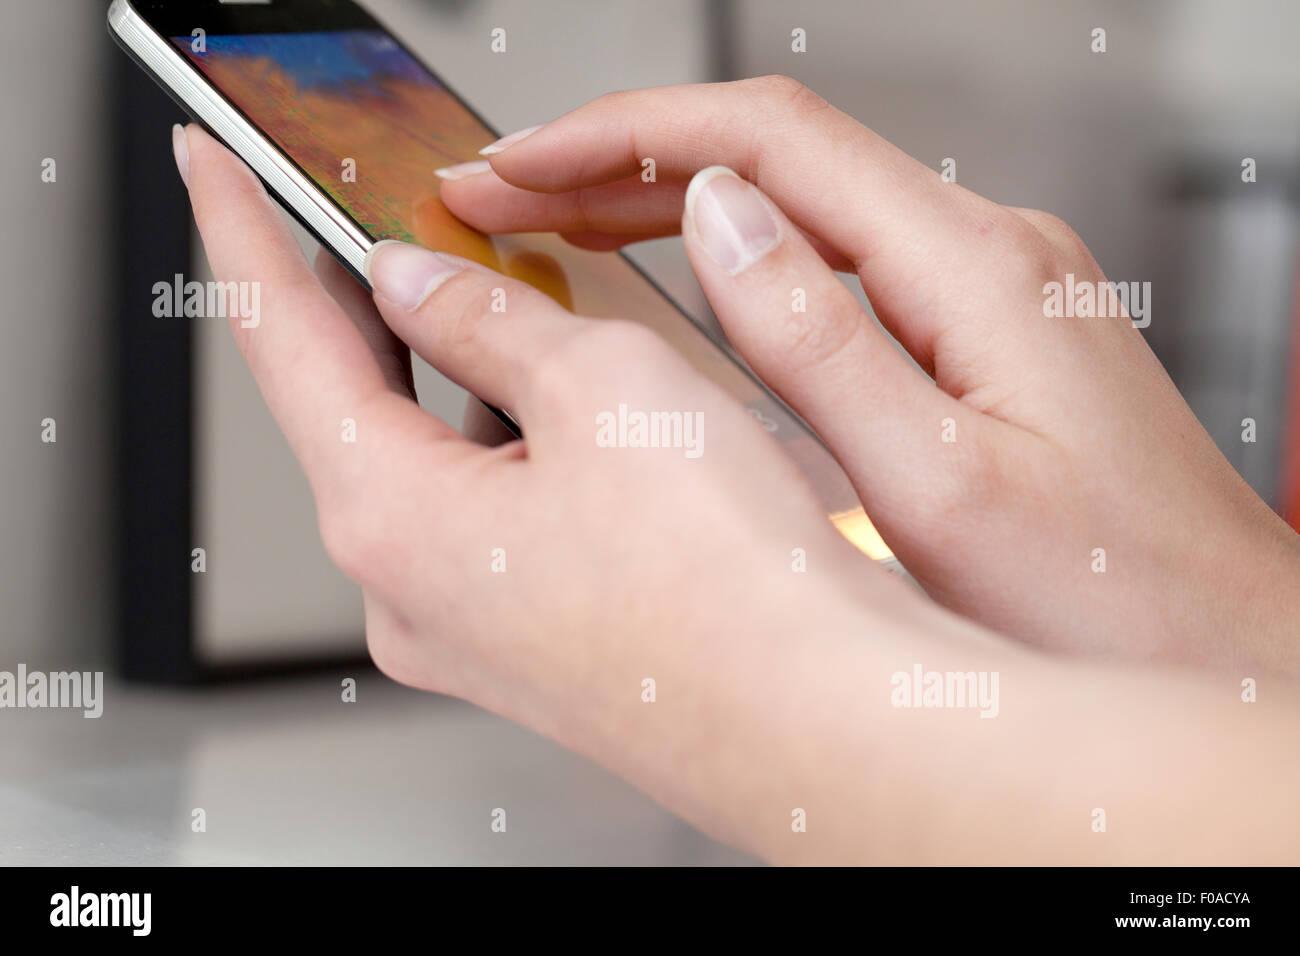 Female hands using smartphone - Stock Image